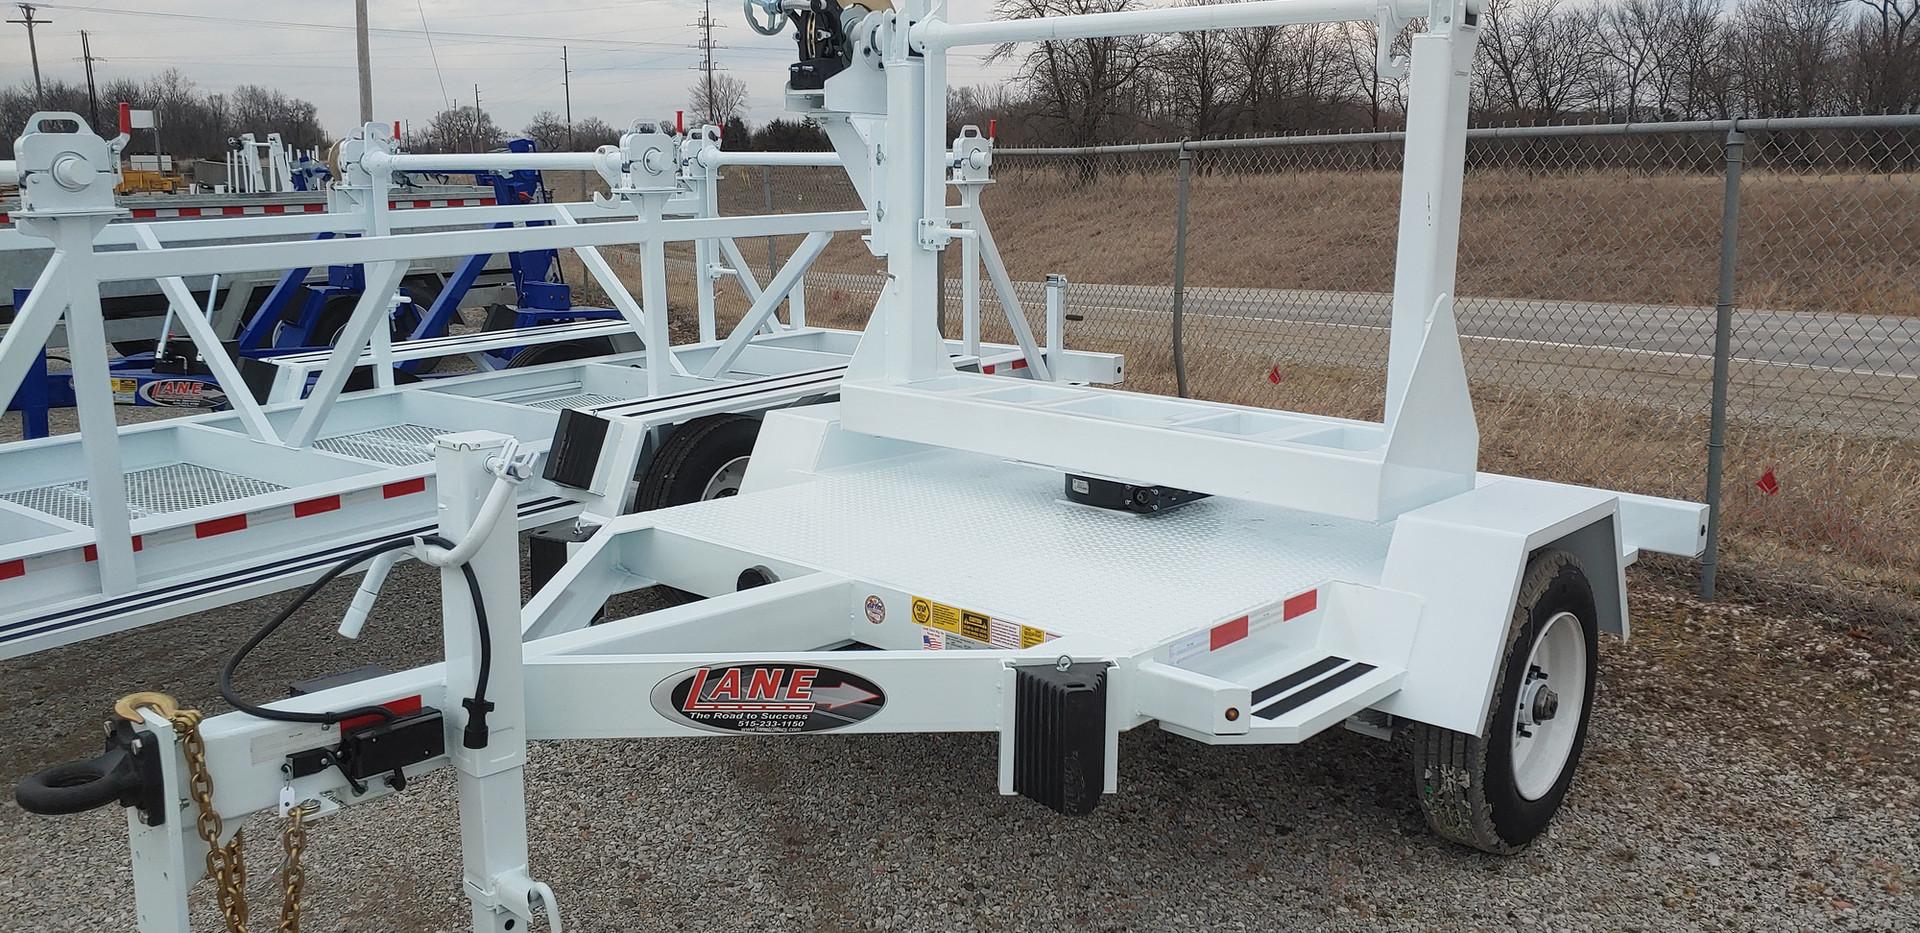 LANE Single Reel Turret Trailer - 10,000 lbs